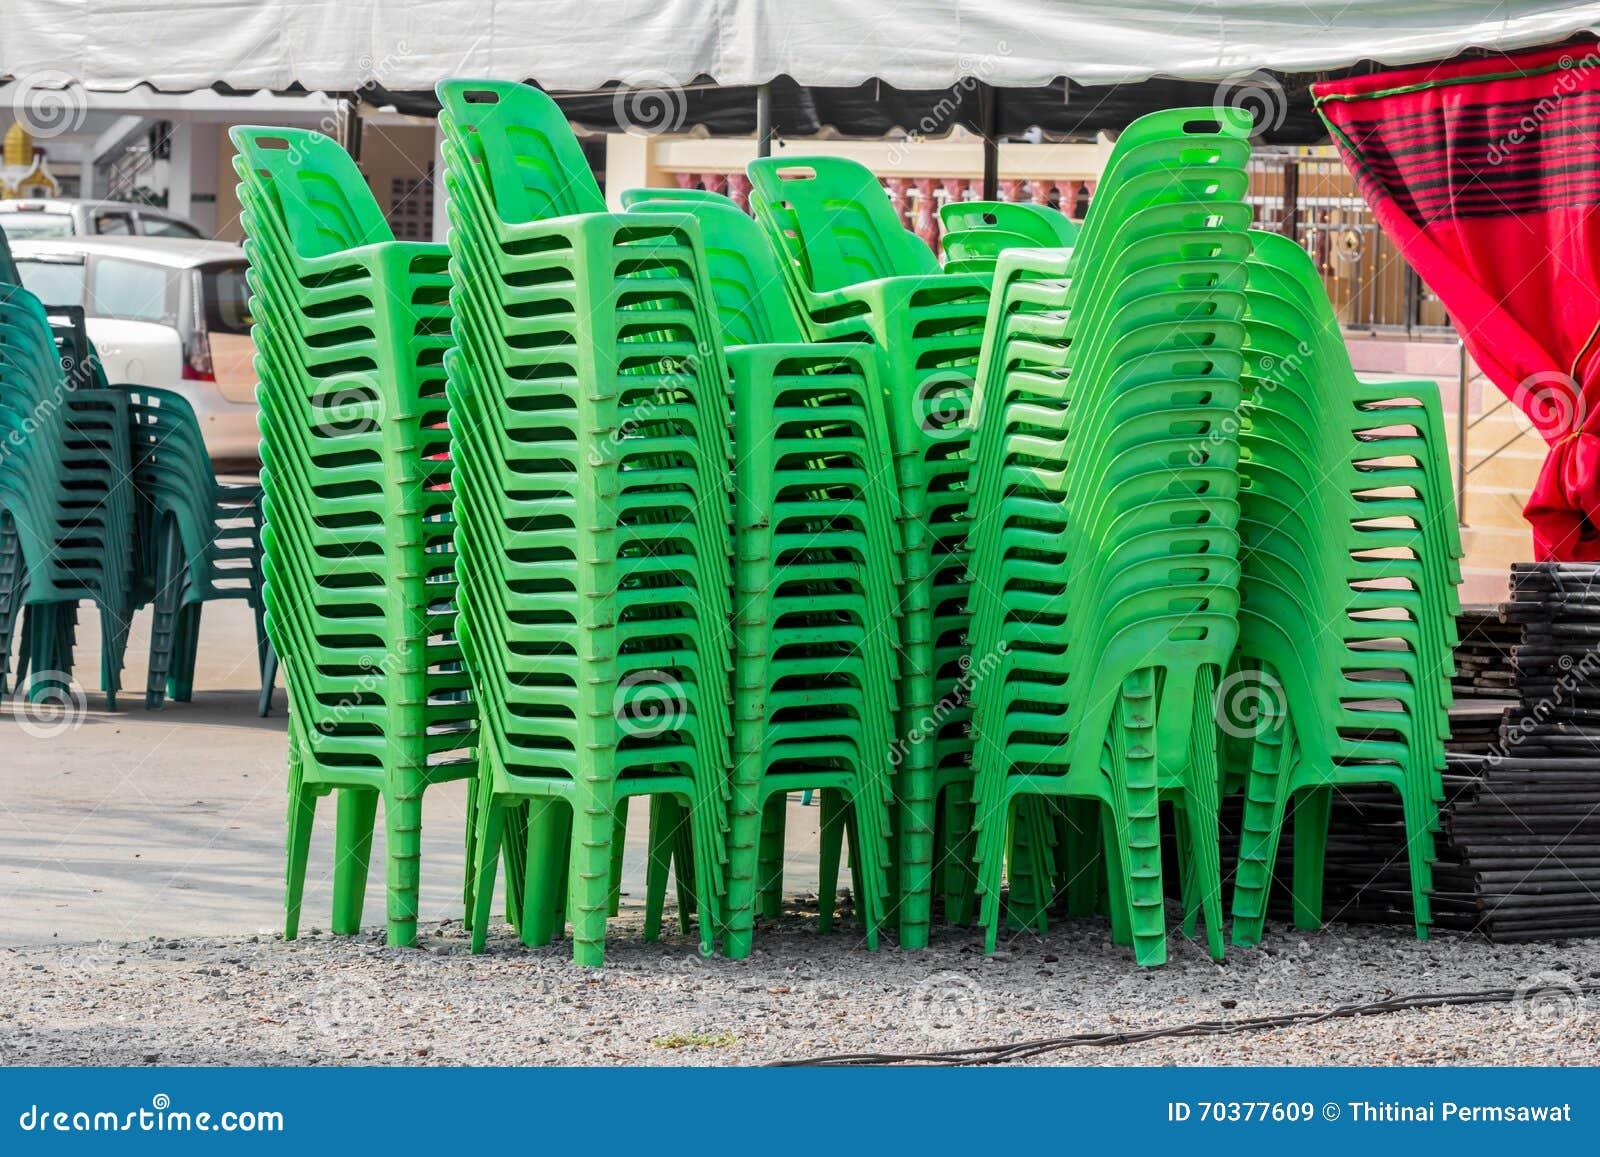 Sedie Verdi Di Plastica.Sedie Di Plastica Verdi Immagine Stock Immagine Di Esterno 70377609